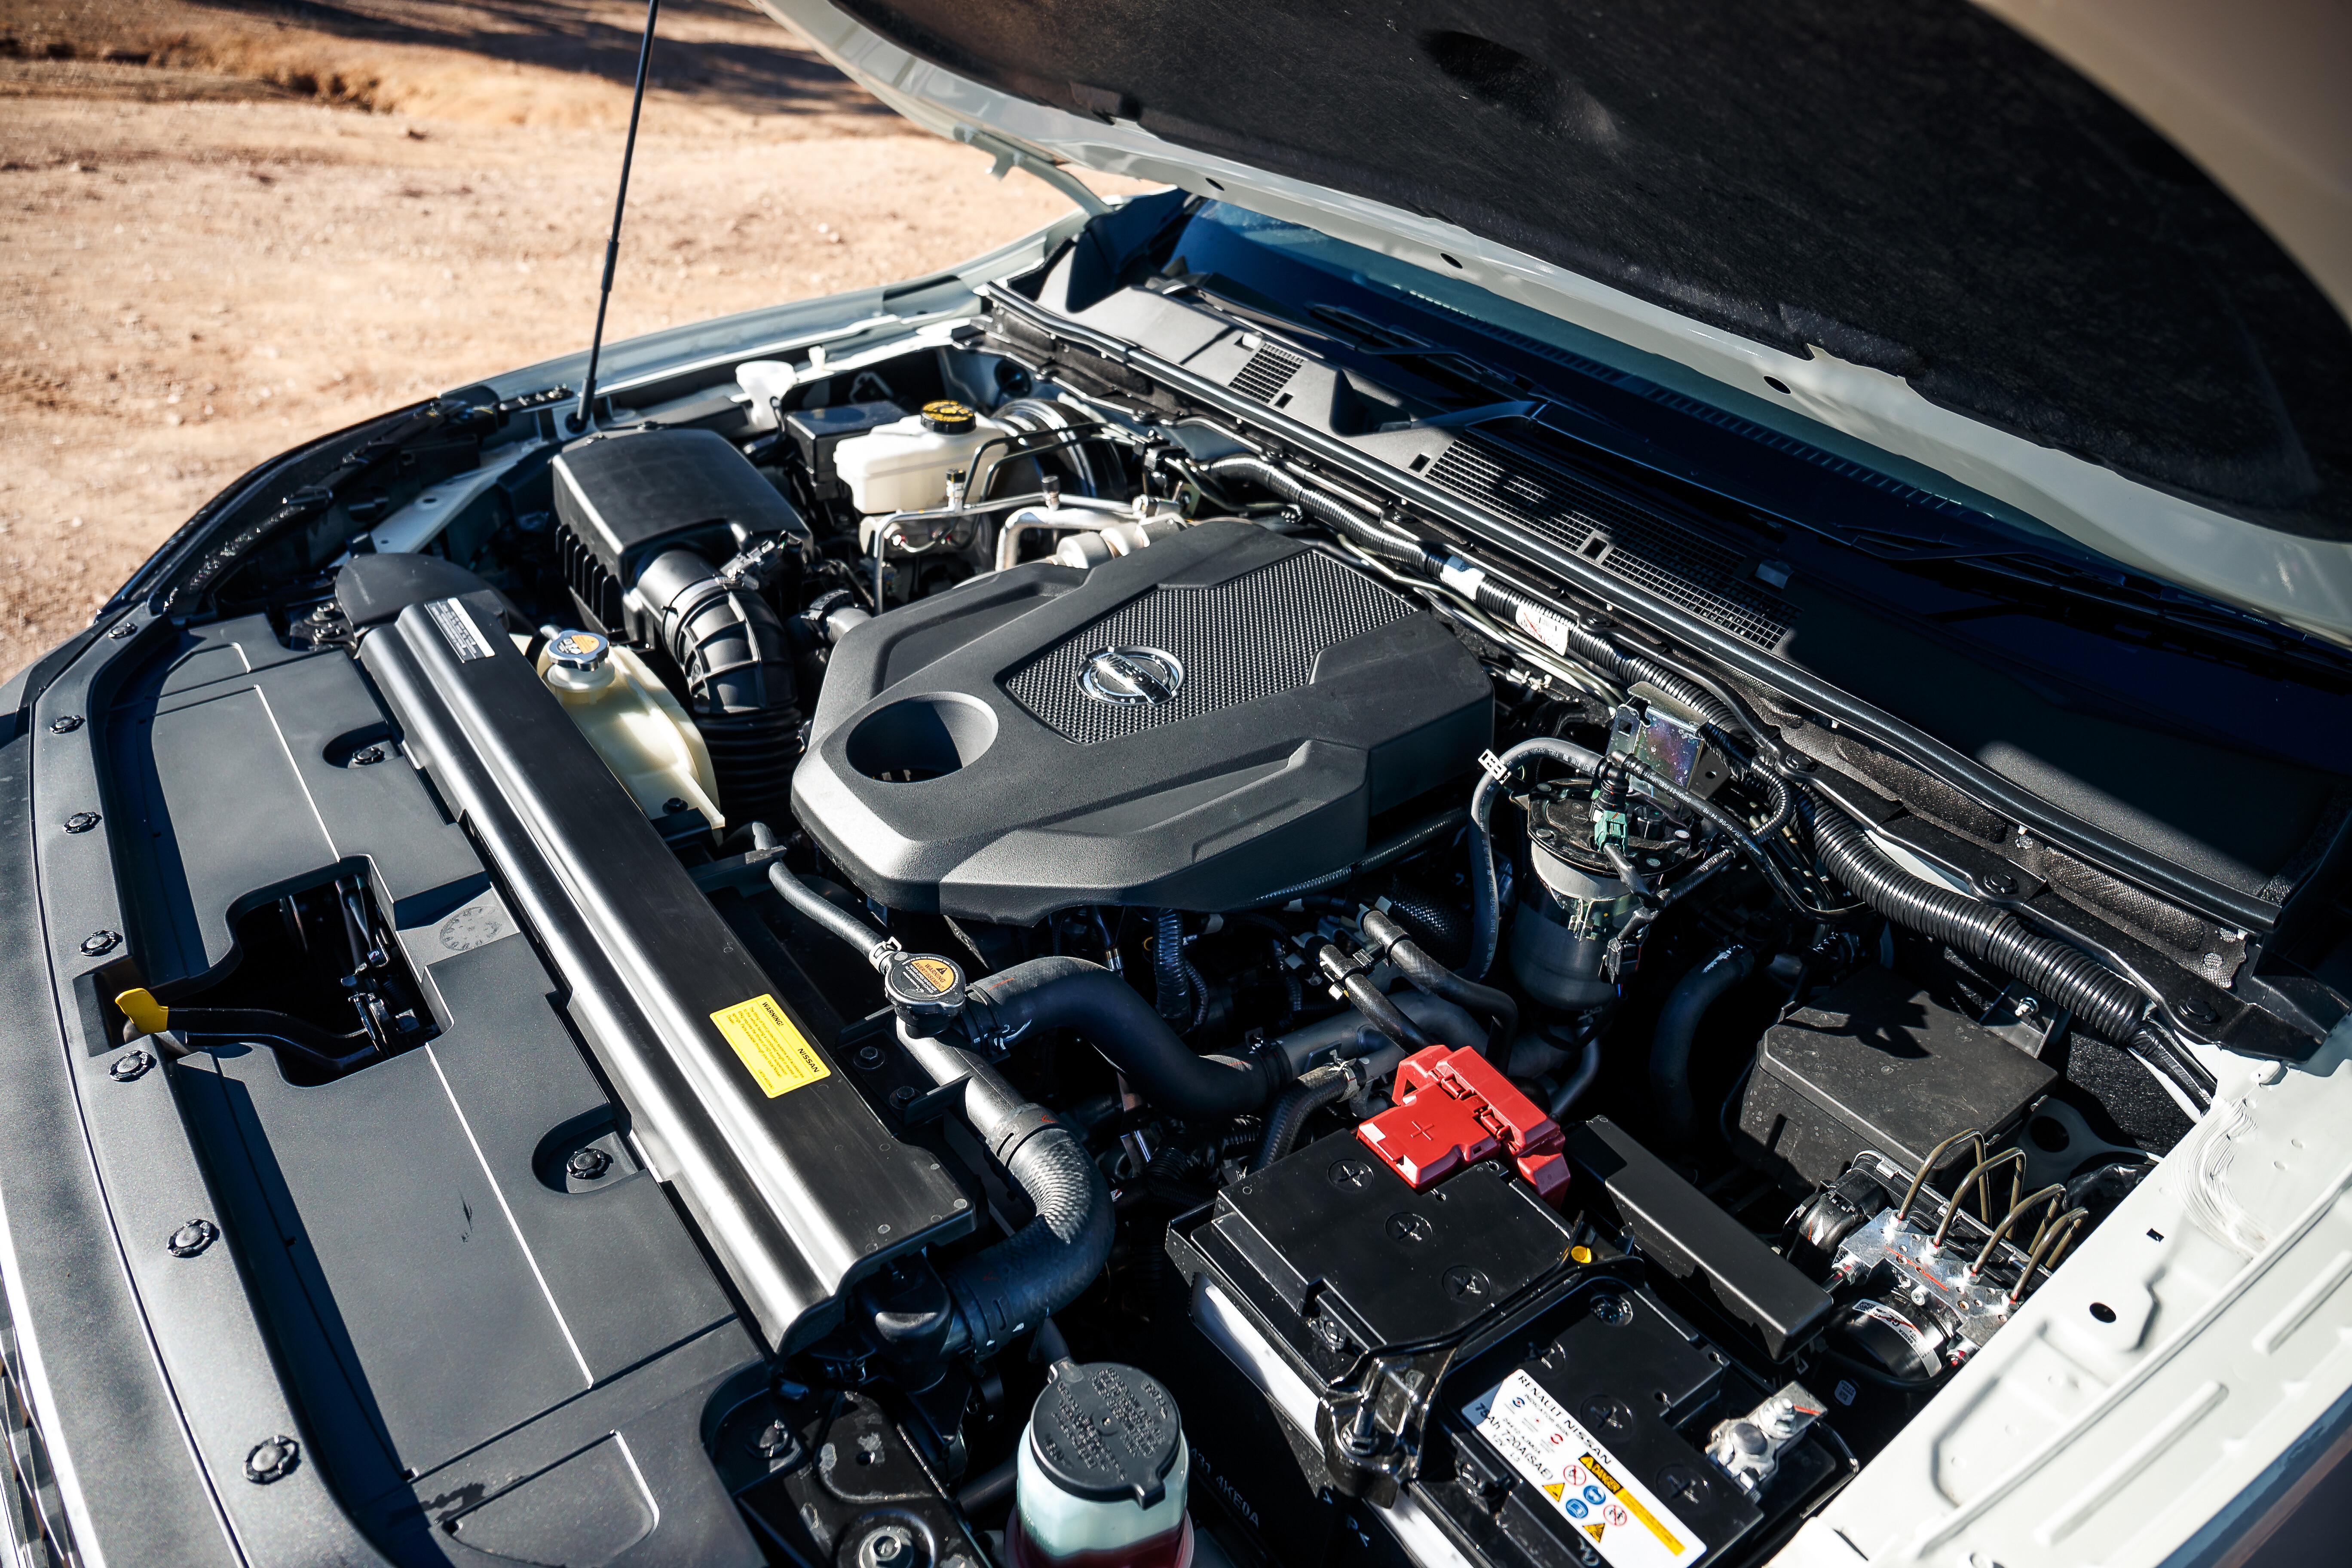 4 X 4 Australia Reviews 2021 May 2021 Nissan Navara PRO 4 X 17